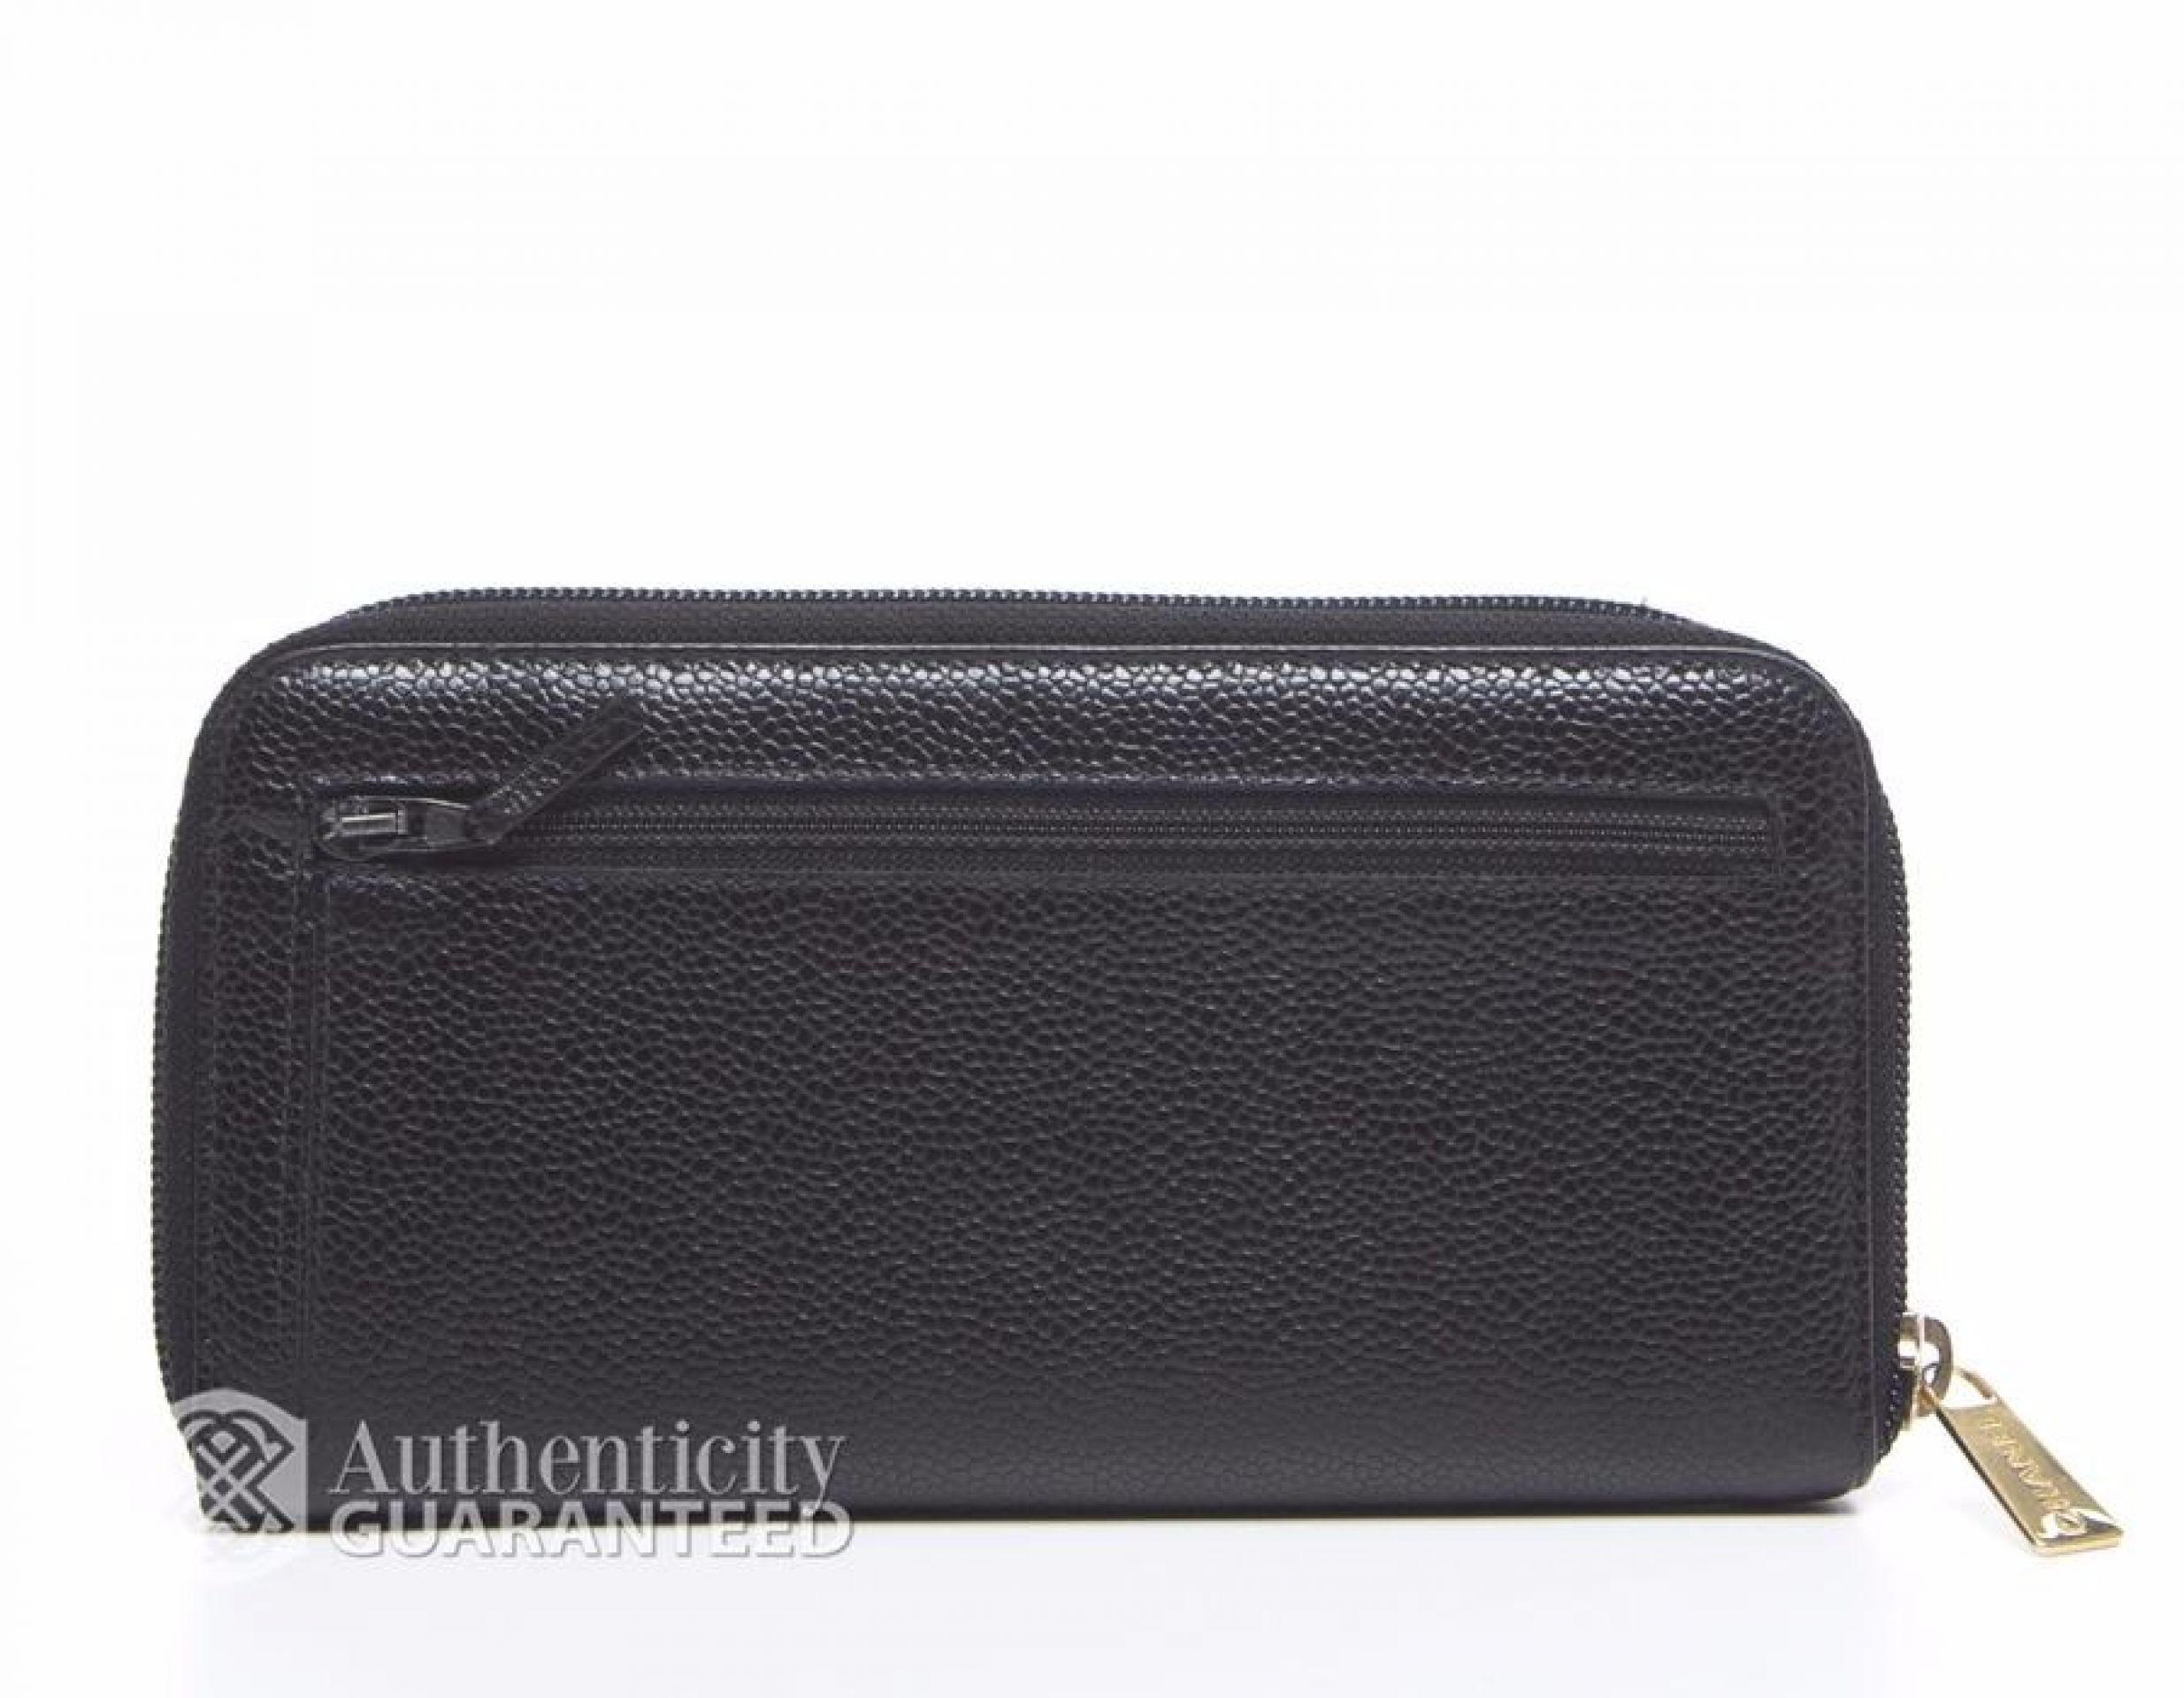 Chanel Black Caviar Classic Zippy Zip Around Wallet